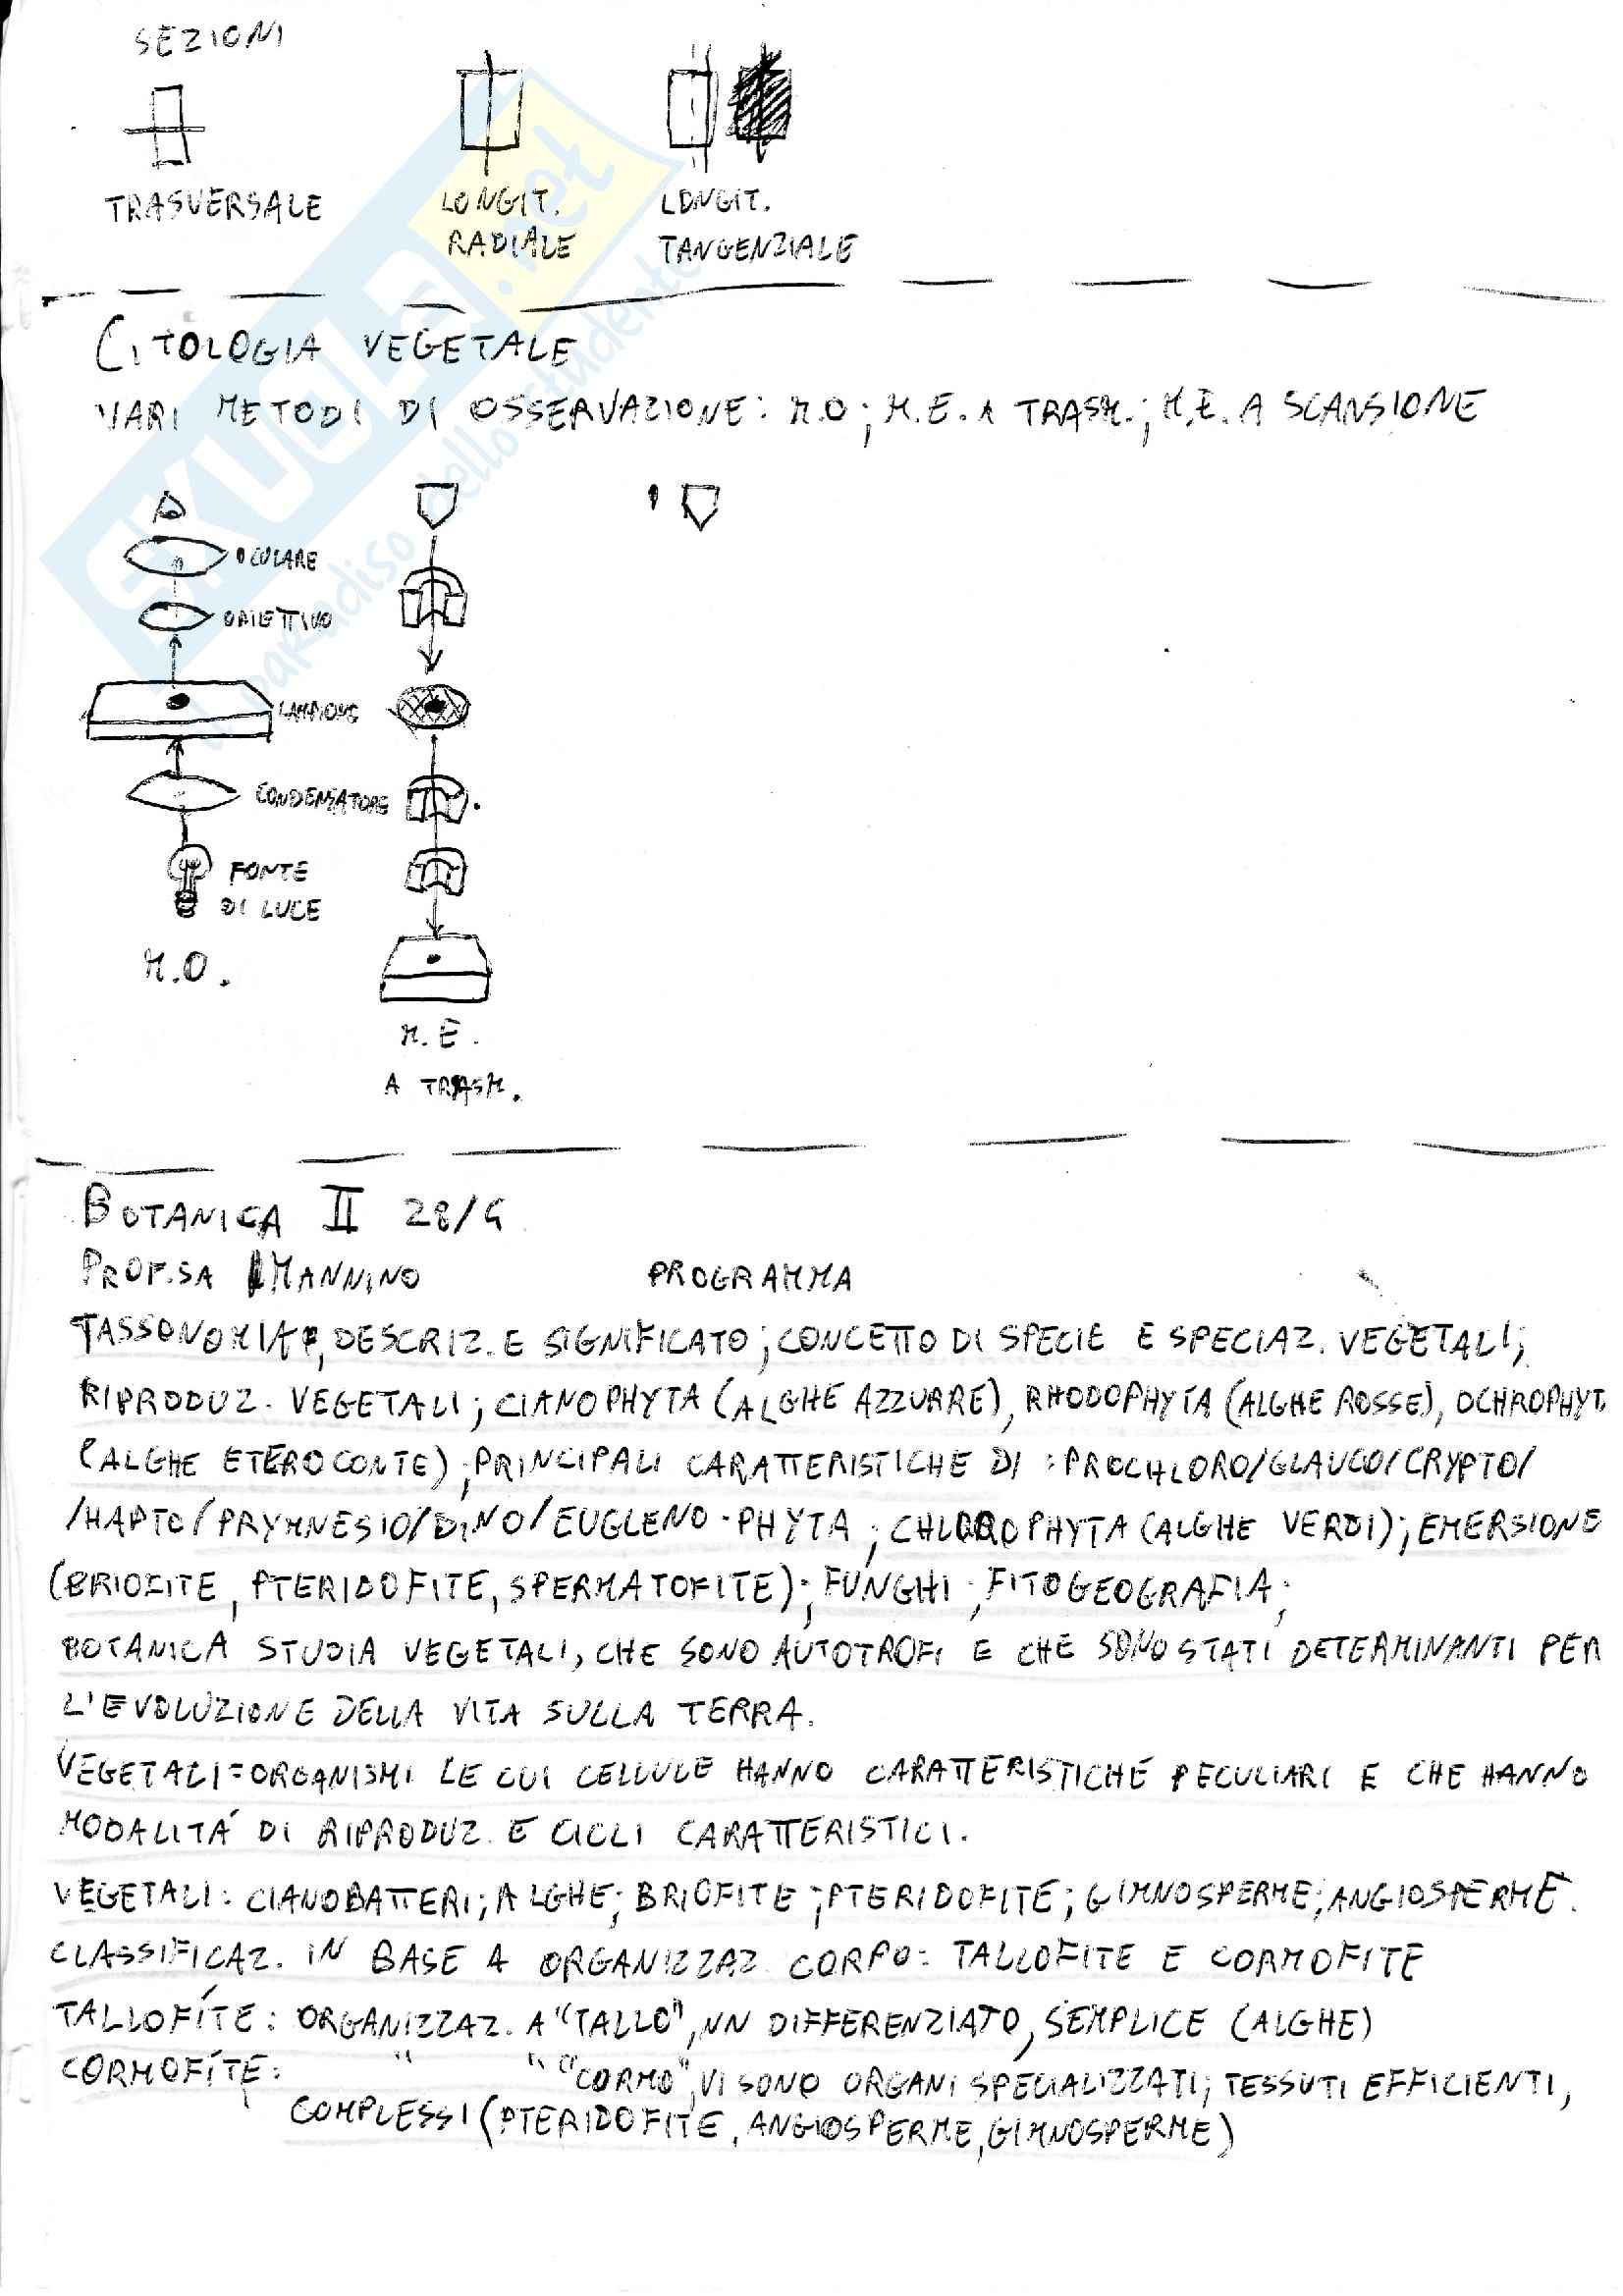 Lezioni, Botanica Sistematica